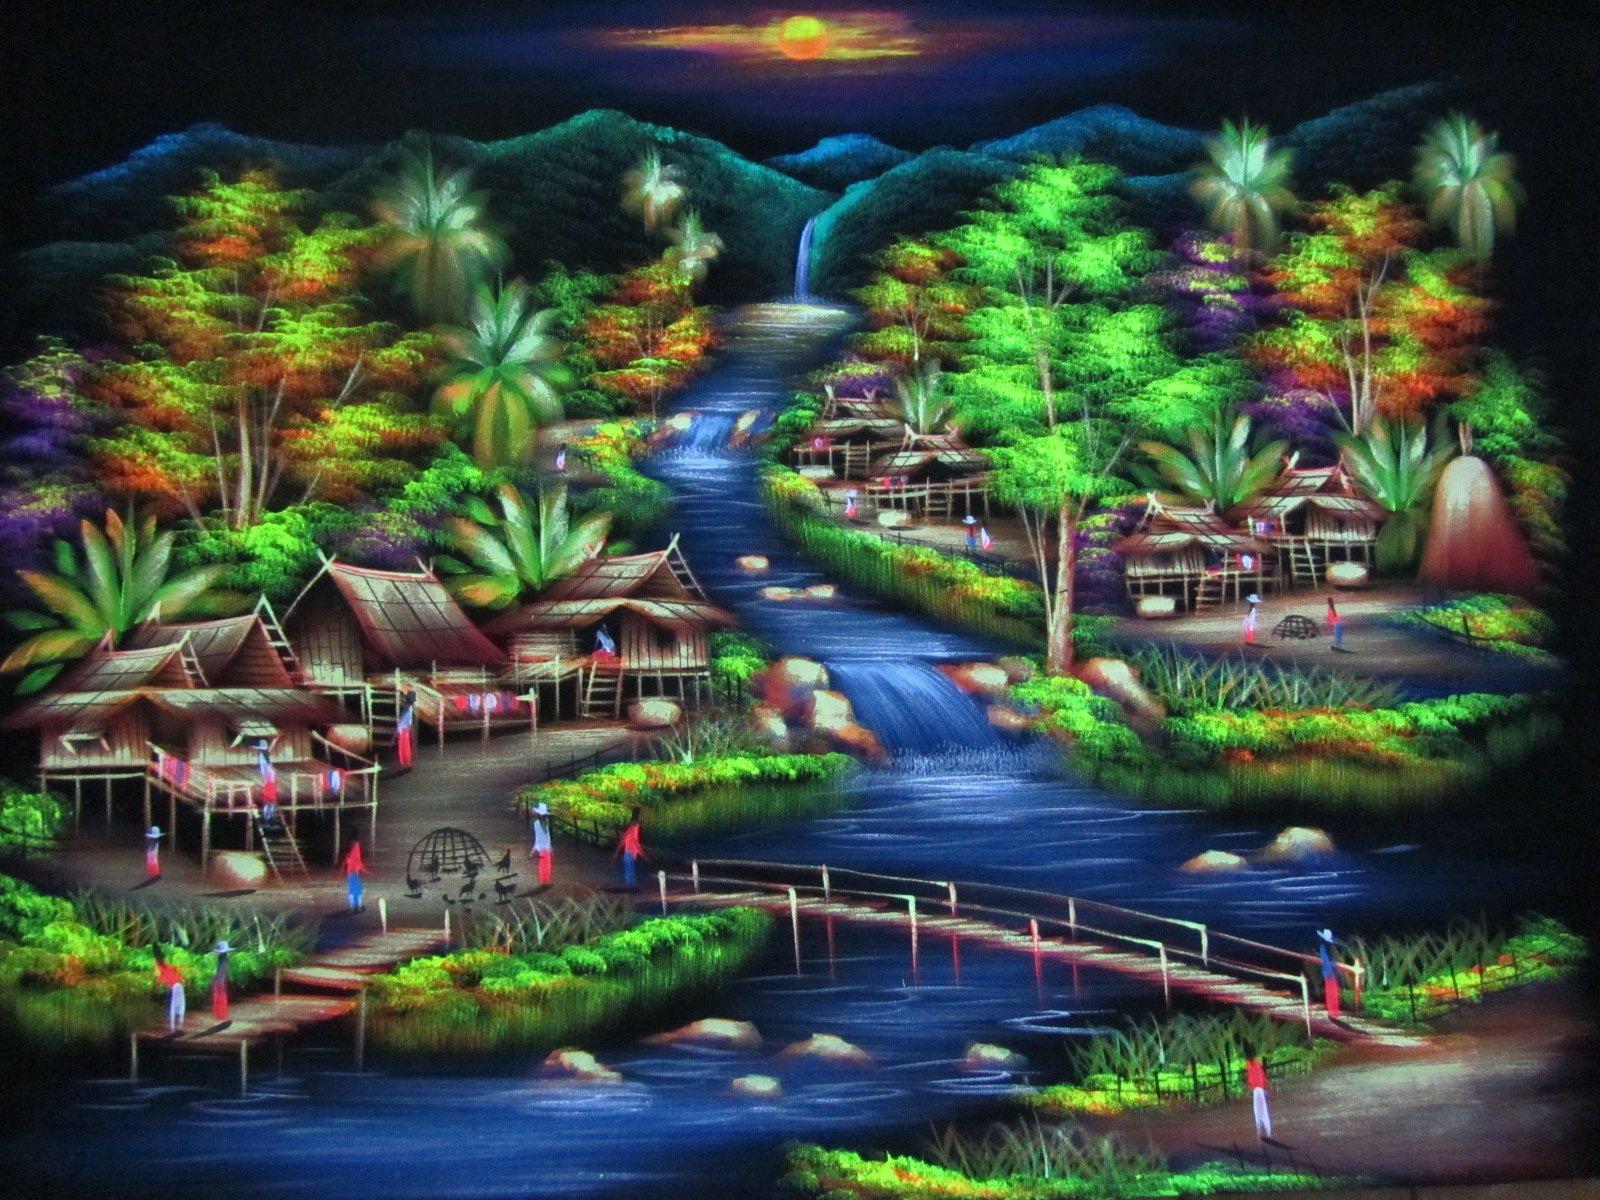 Blue Orchid Hand Painted Thai Village Scene Wall Art Blacklight Painting on Black Velvet Canvas Unframed 39'' x 27''